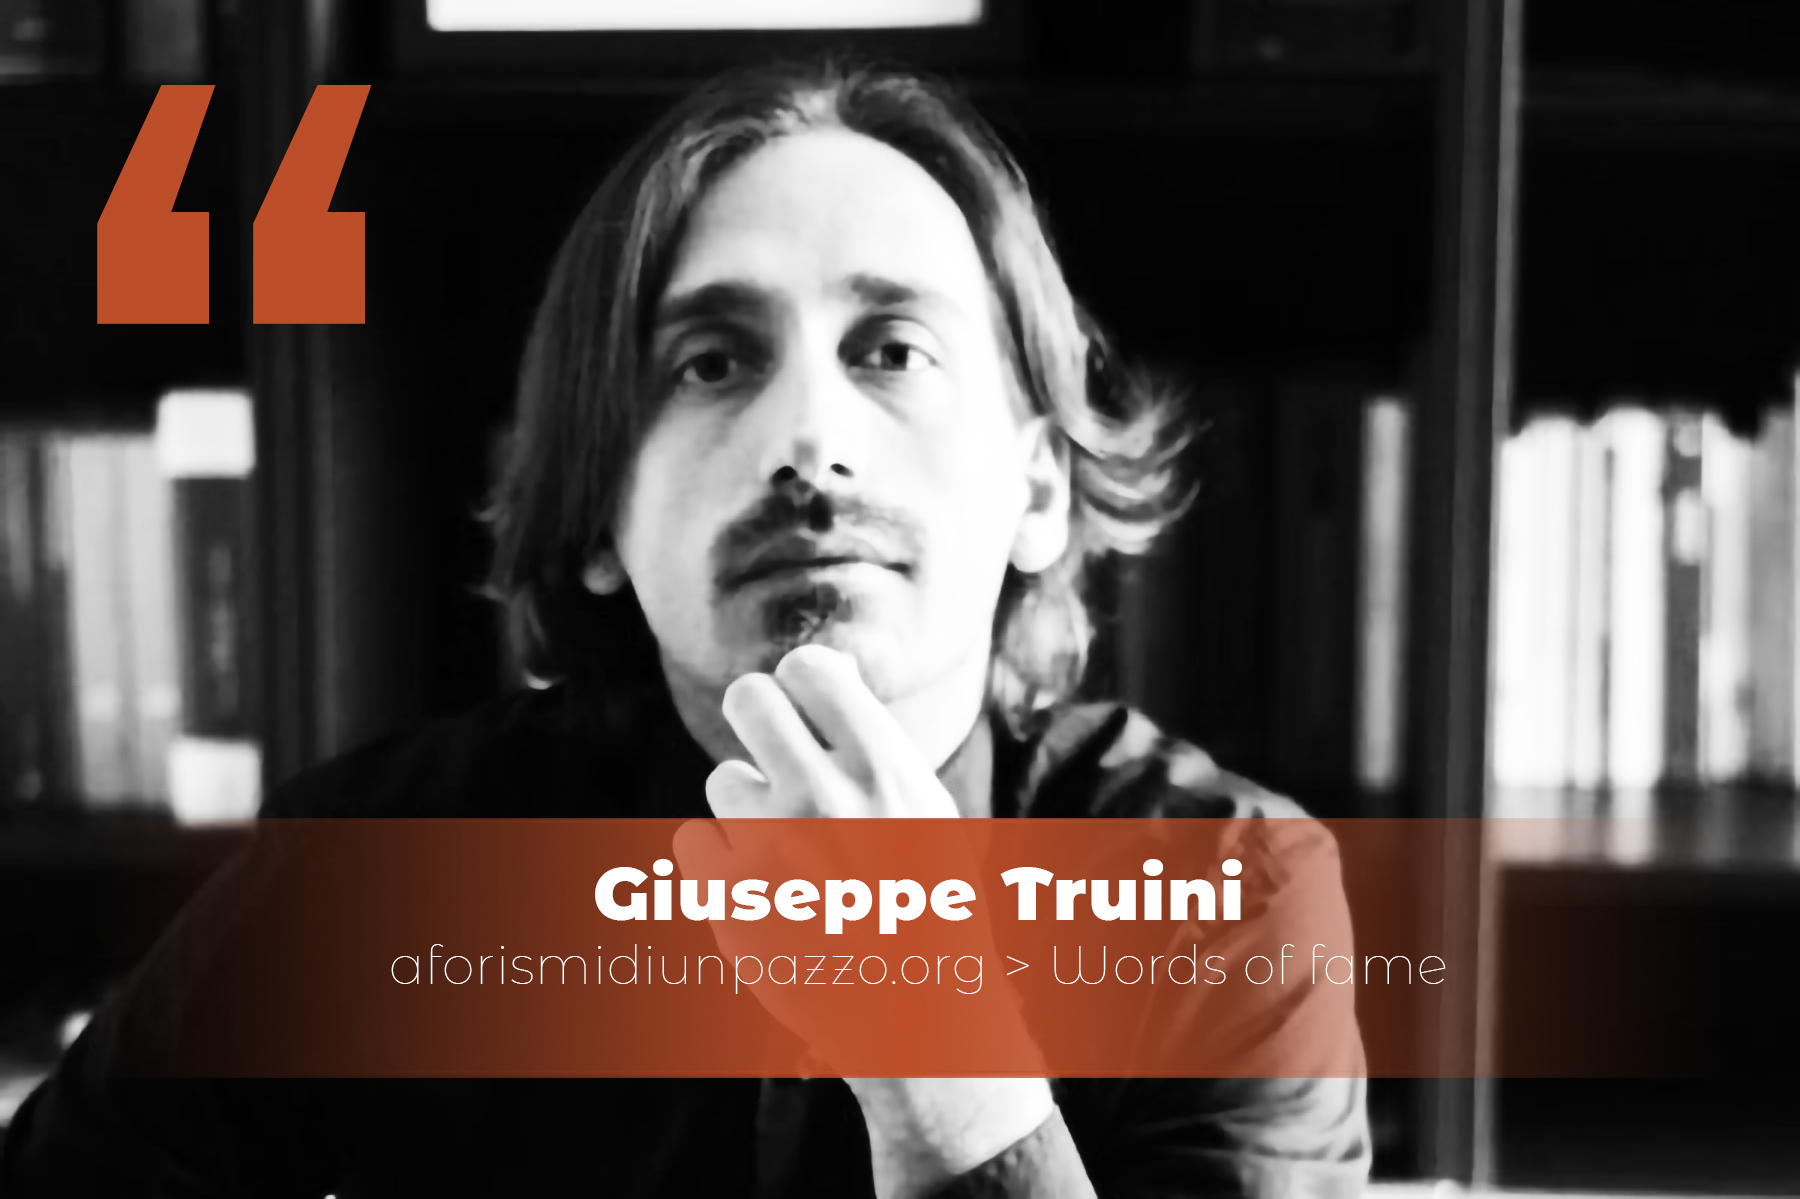 Citazioni di Giuseppe Truini